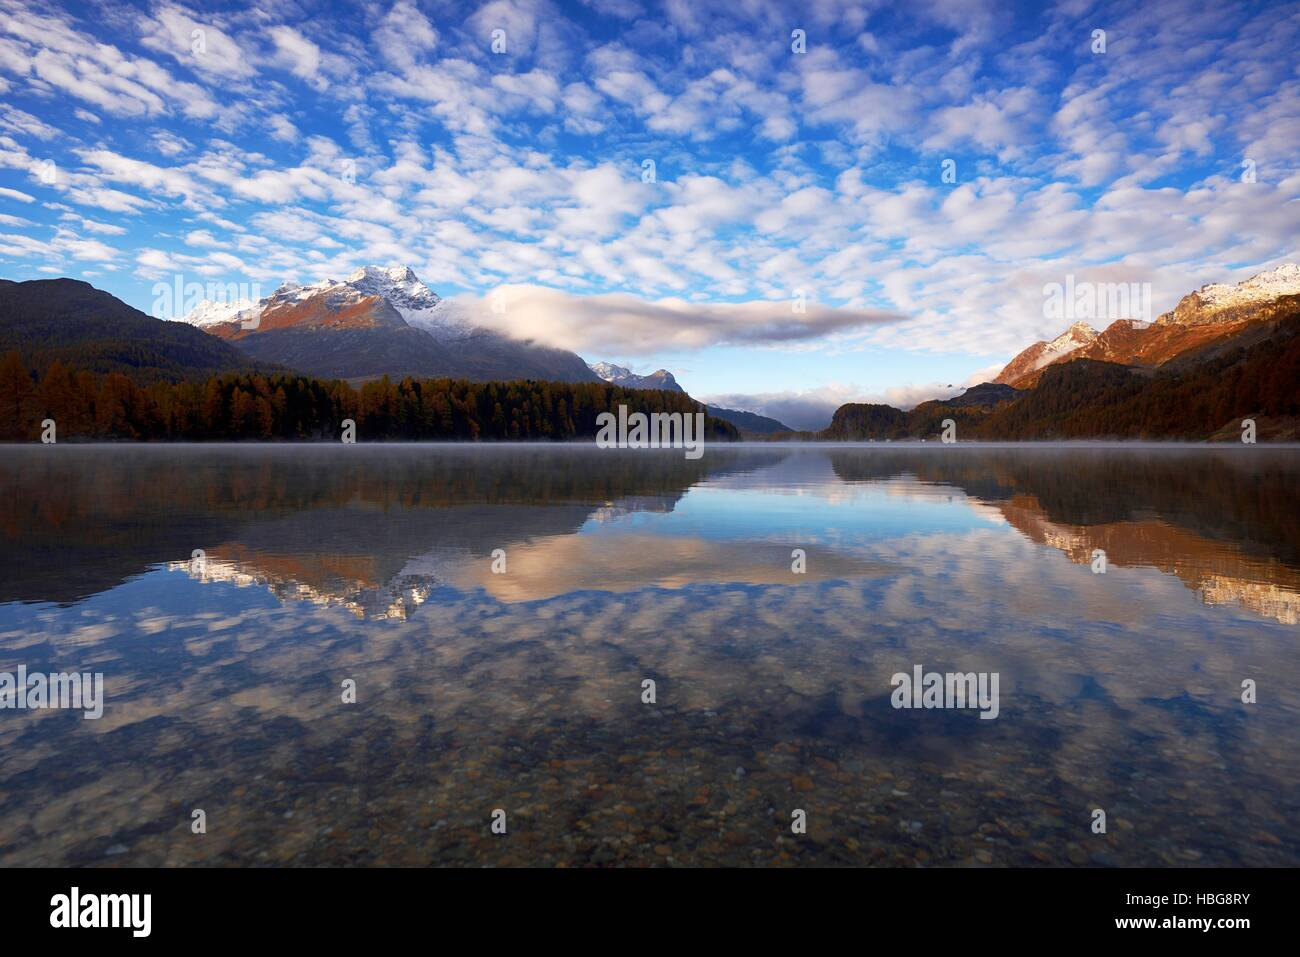 Cloudy sky, Lake Sils, Piz da la Margna behind, Sils, Engadin, Canton of Grisons, Switzerland - Stock Image